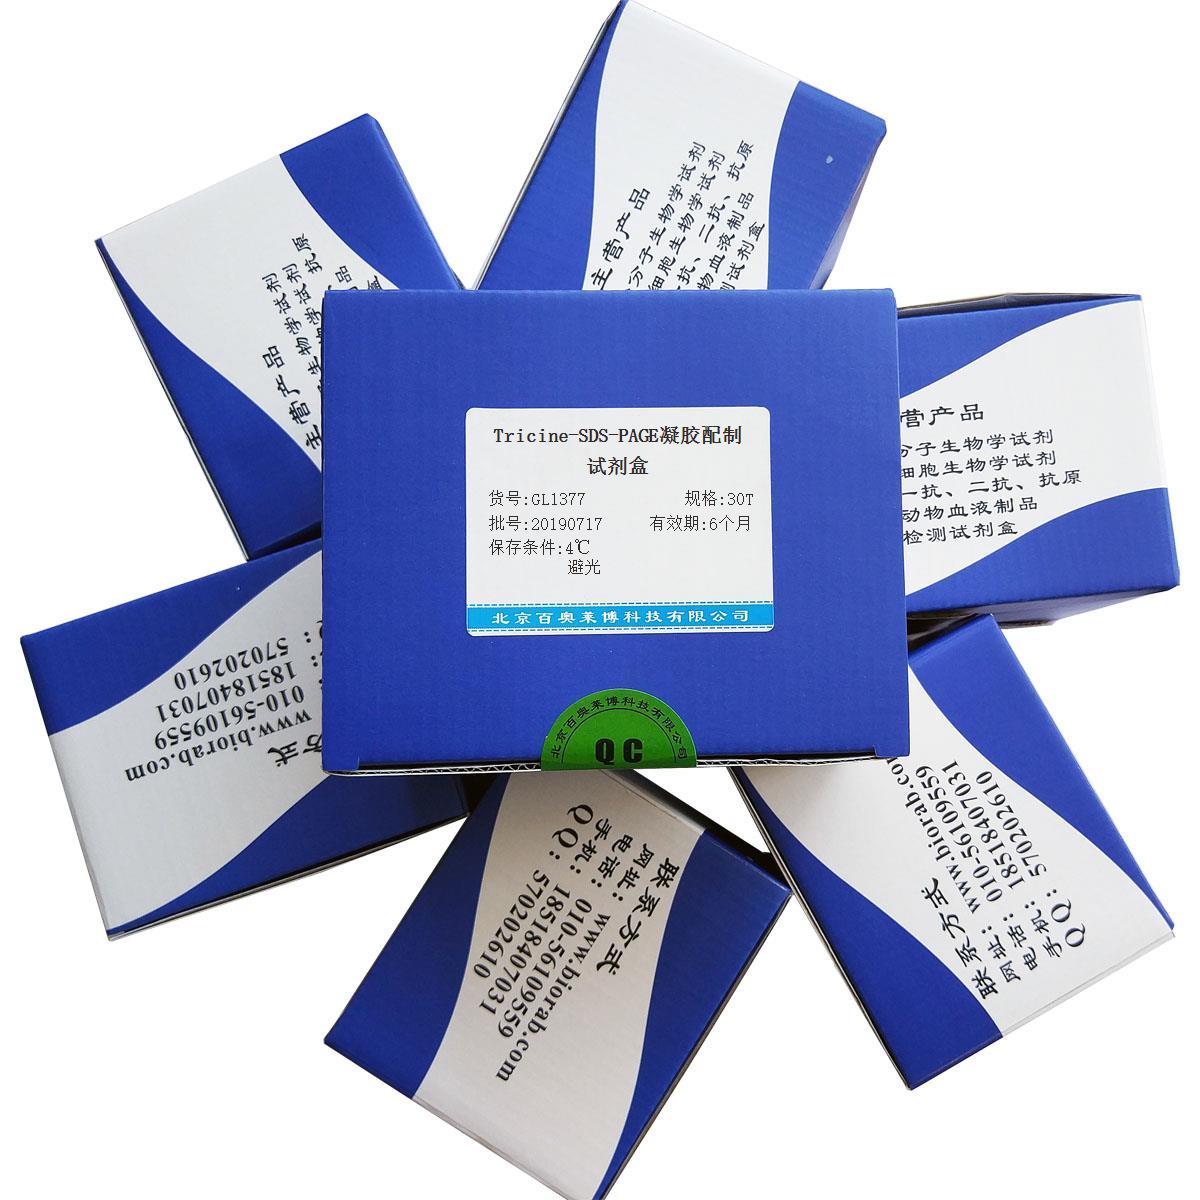 Tricine-SDS-PAGE凝胶配制试剂盒